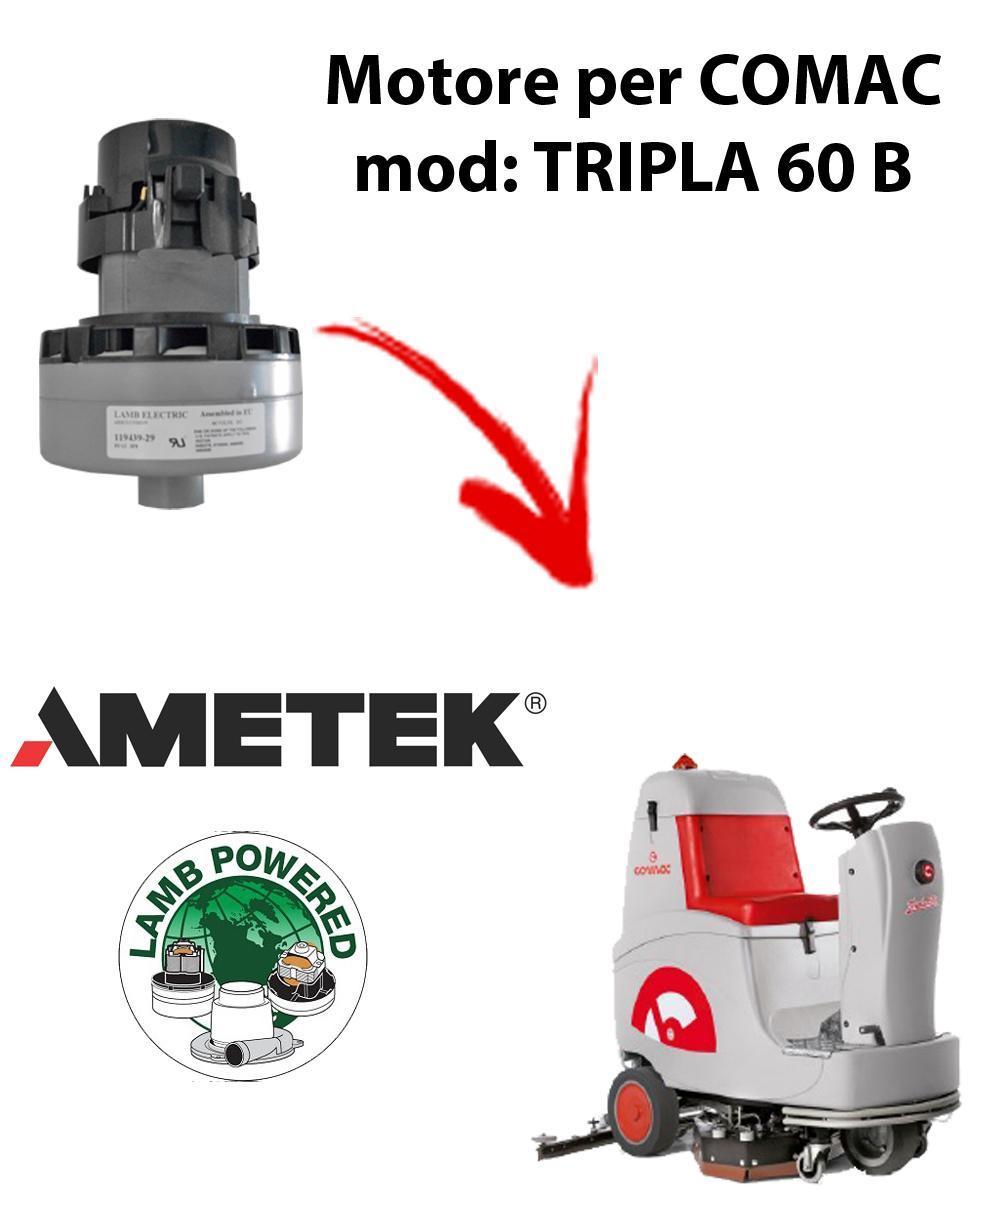 TRIPLA 60B Motore de aspiración AMETEK para fregadora Comac